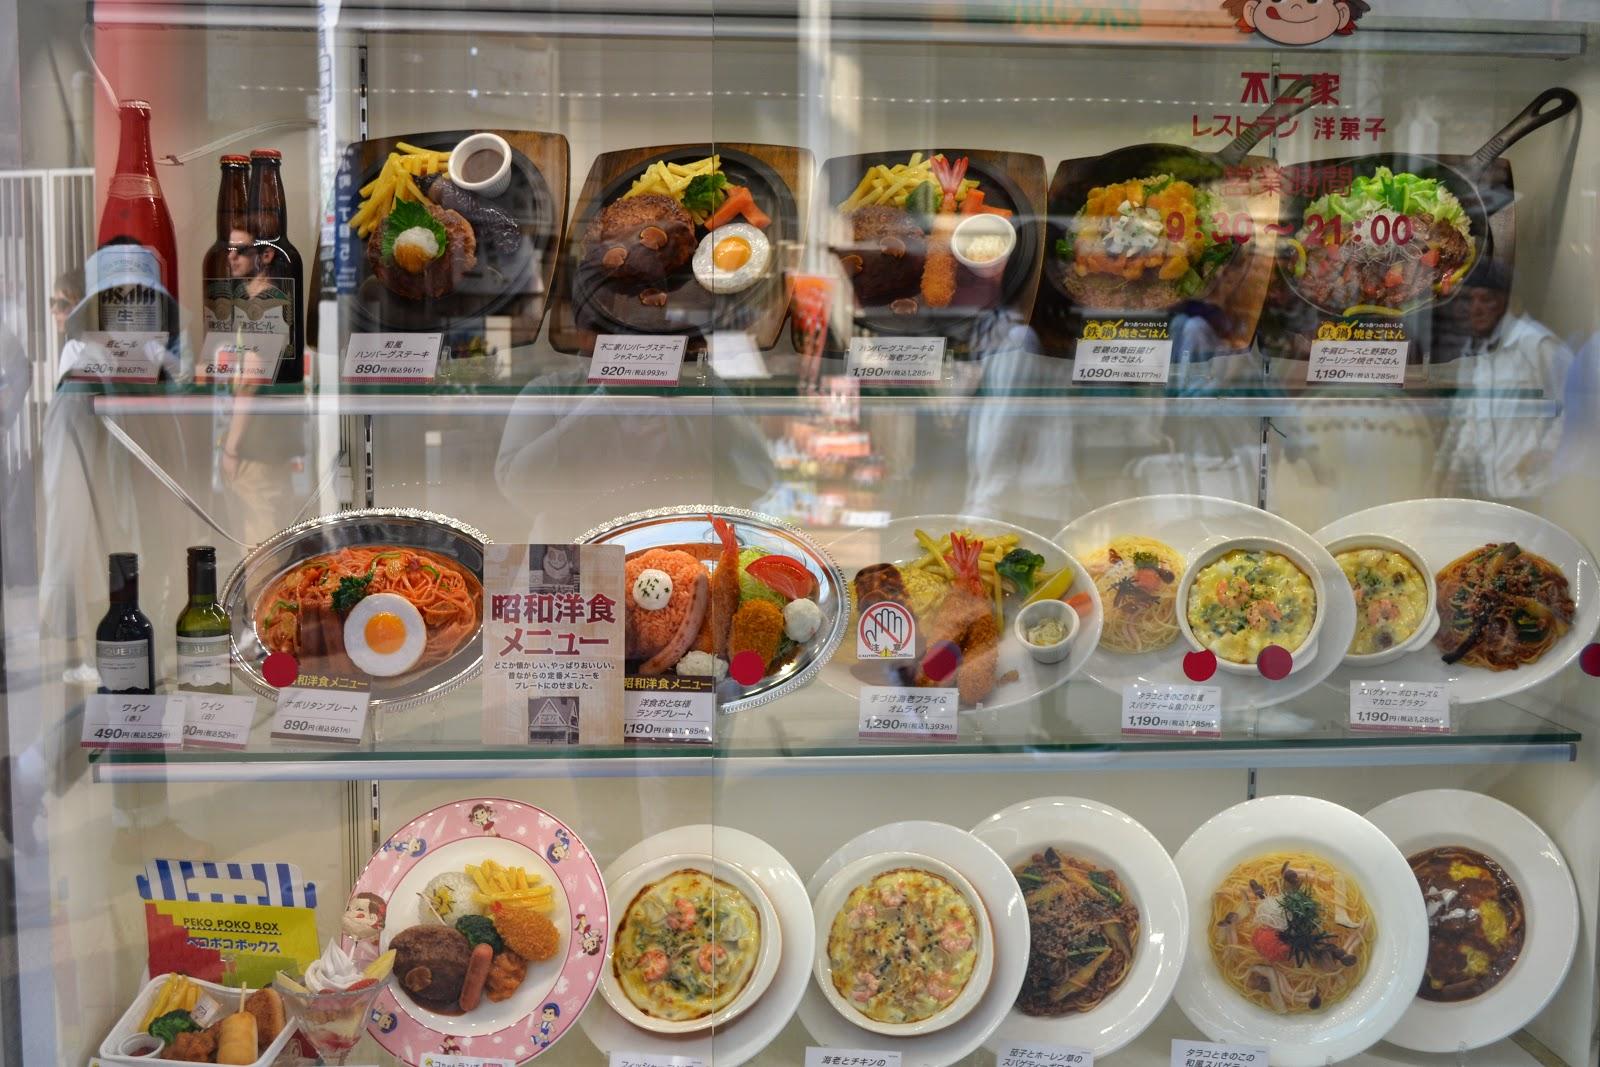 Jendela Makan dalam Diet OCD ala Deddy Corbuzier, Apa Itu?